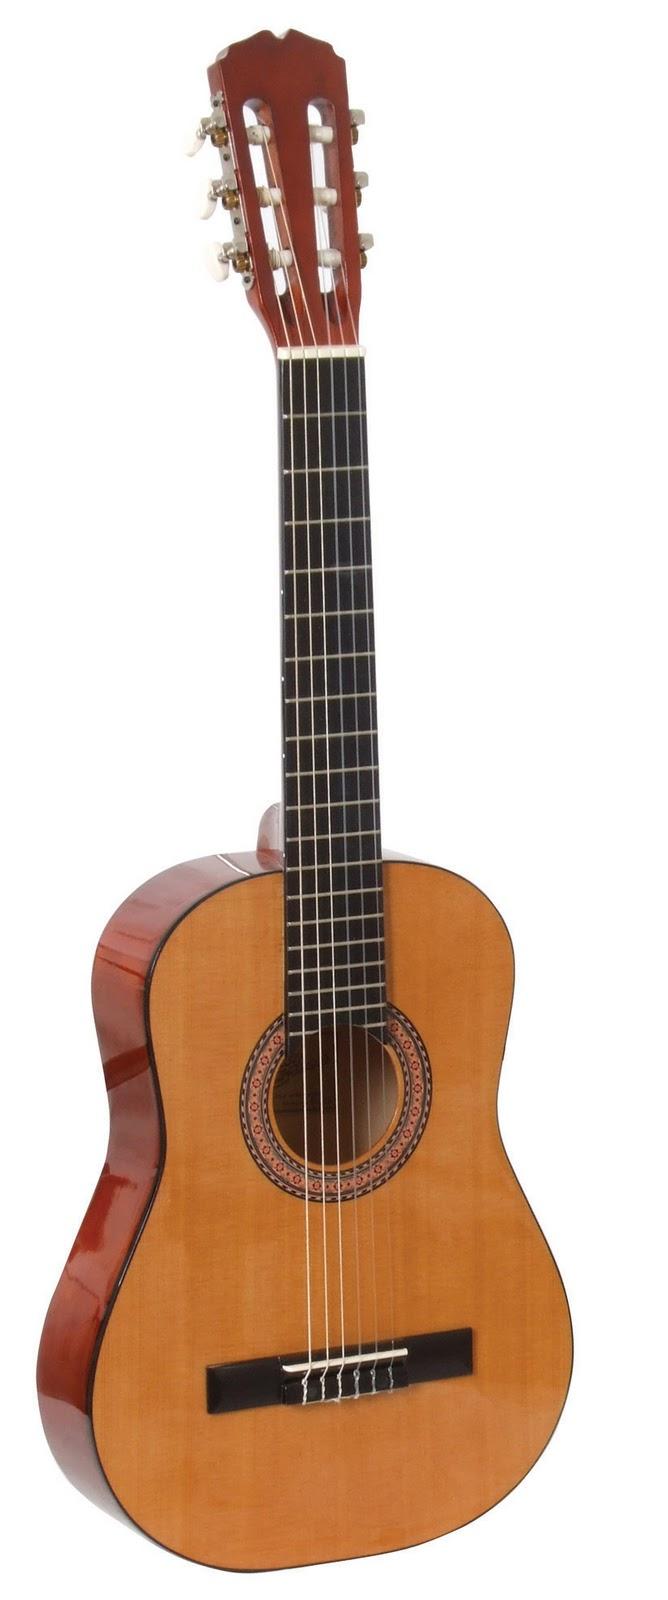 types of guitars sinhala guitar chords sinhala songs chords guitar tabs sinhala midi tracks. Black Bedroom Furniture Sets. Home Design Ideas